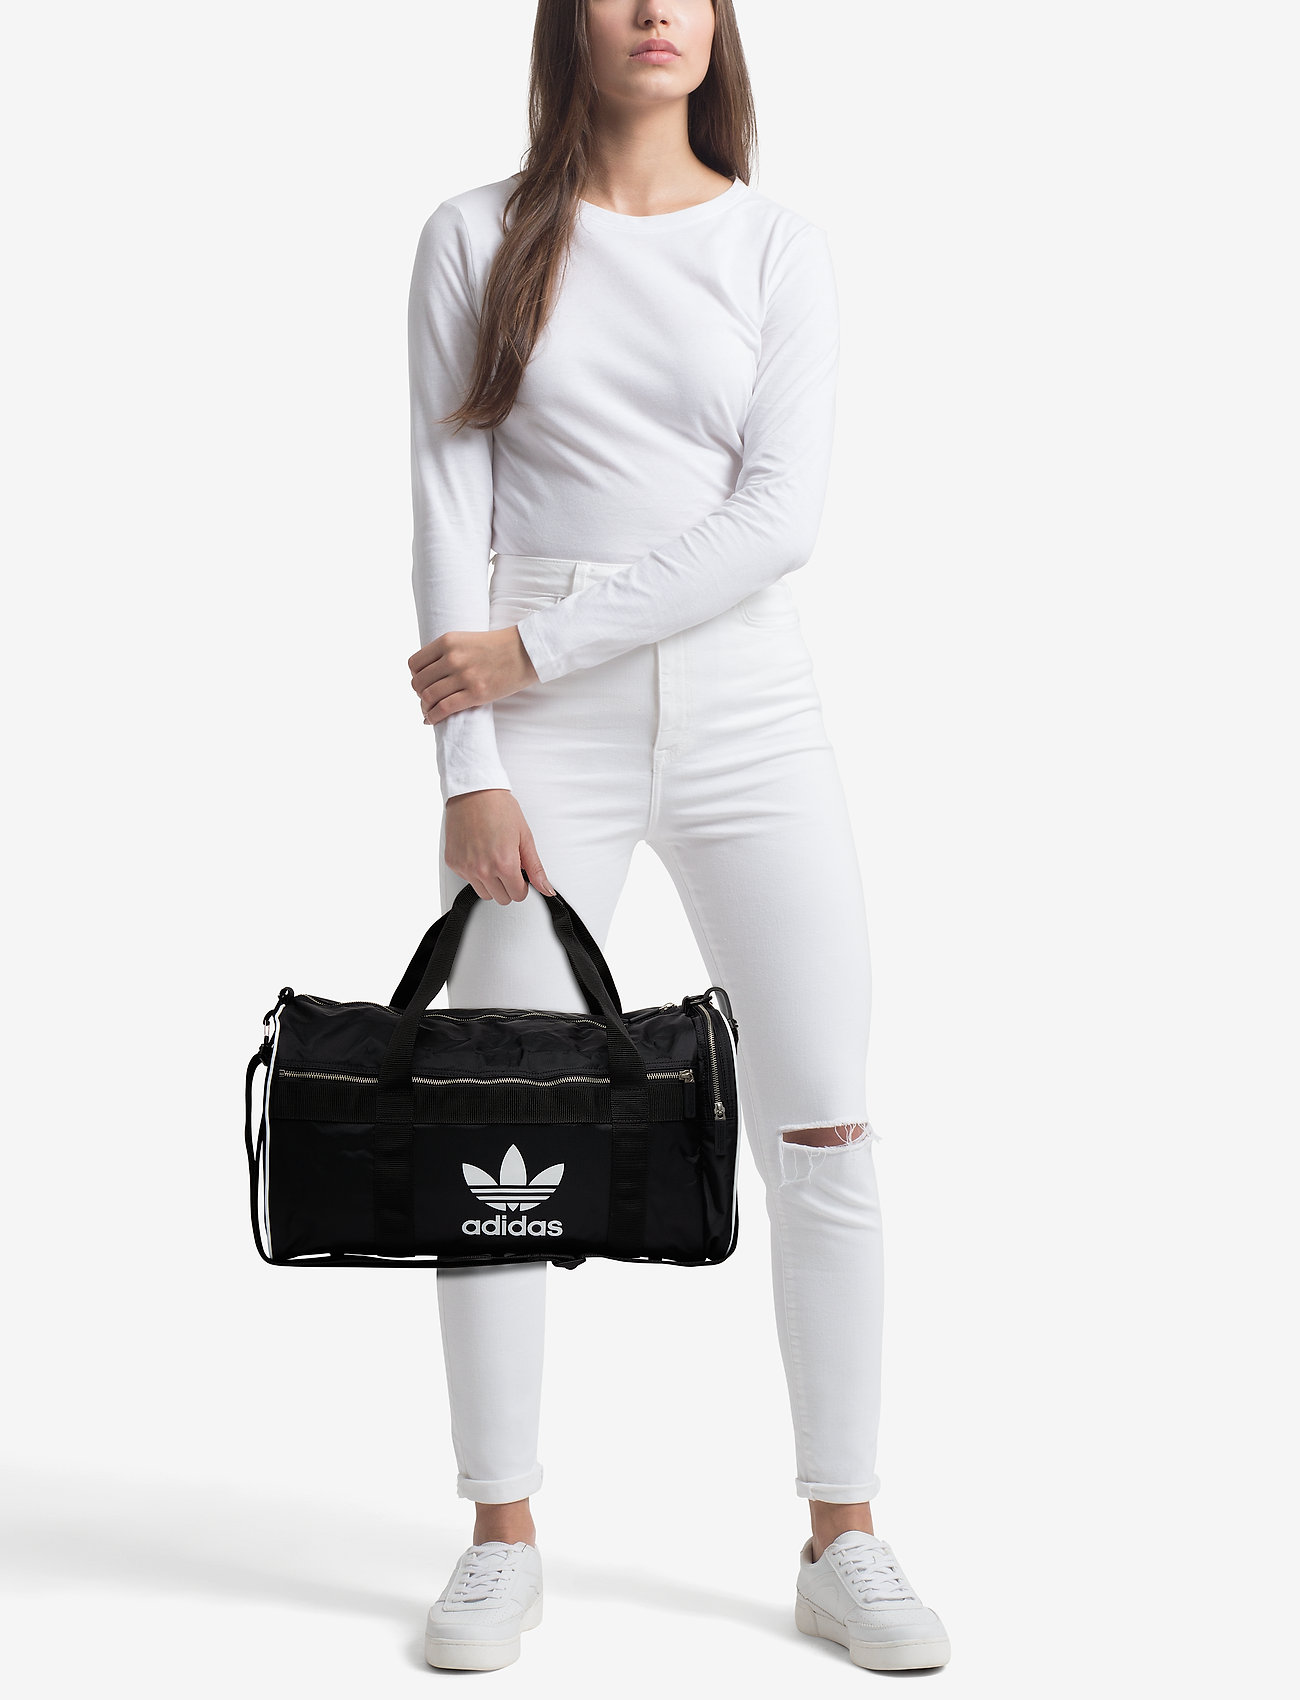 98607dd4231 Duffle L Ac (Black) (£35.97) - adidas Originals - | Boozt.com